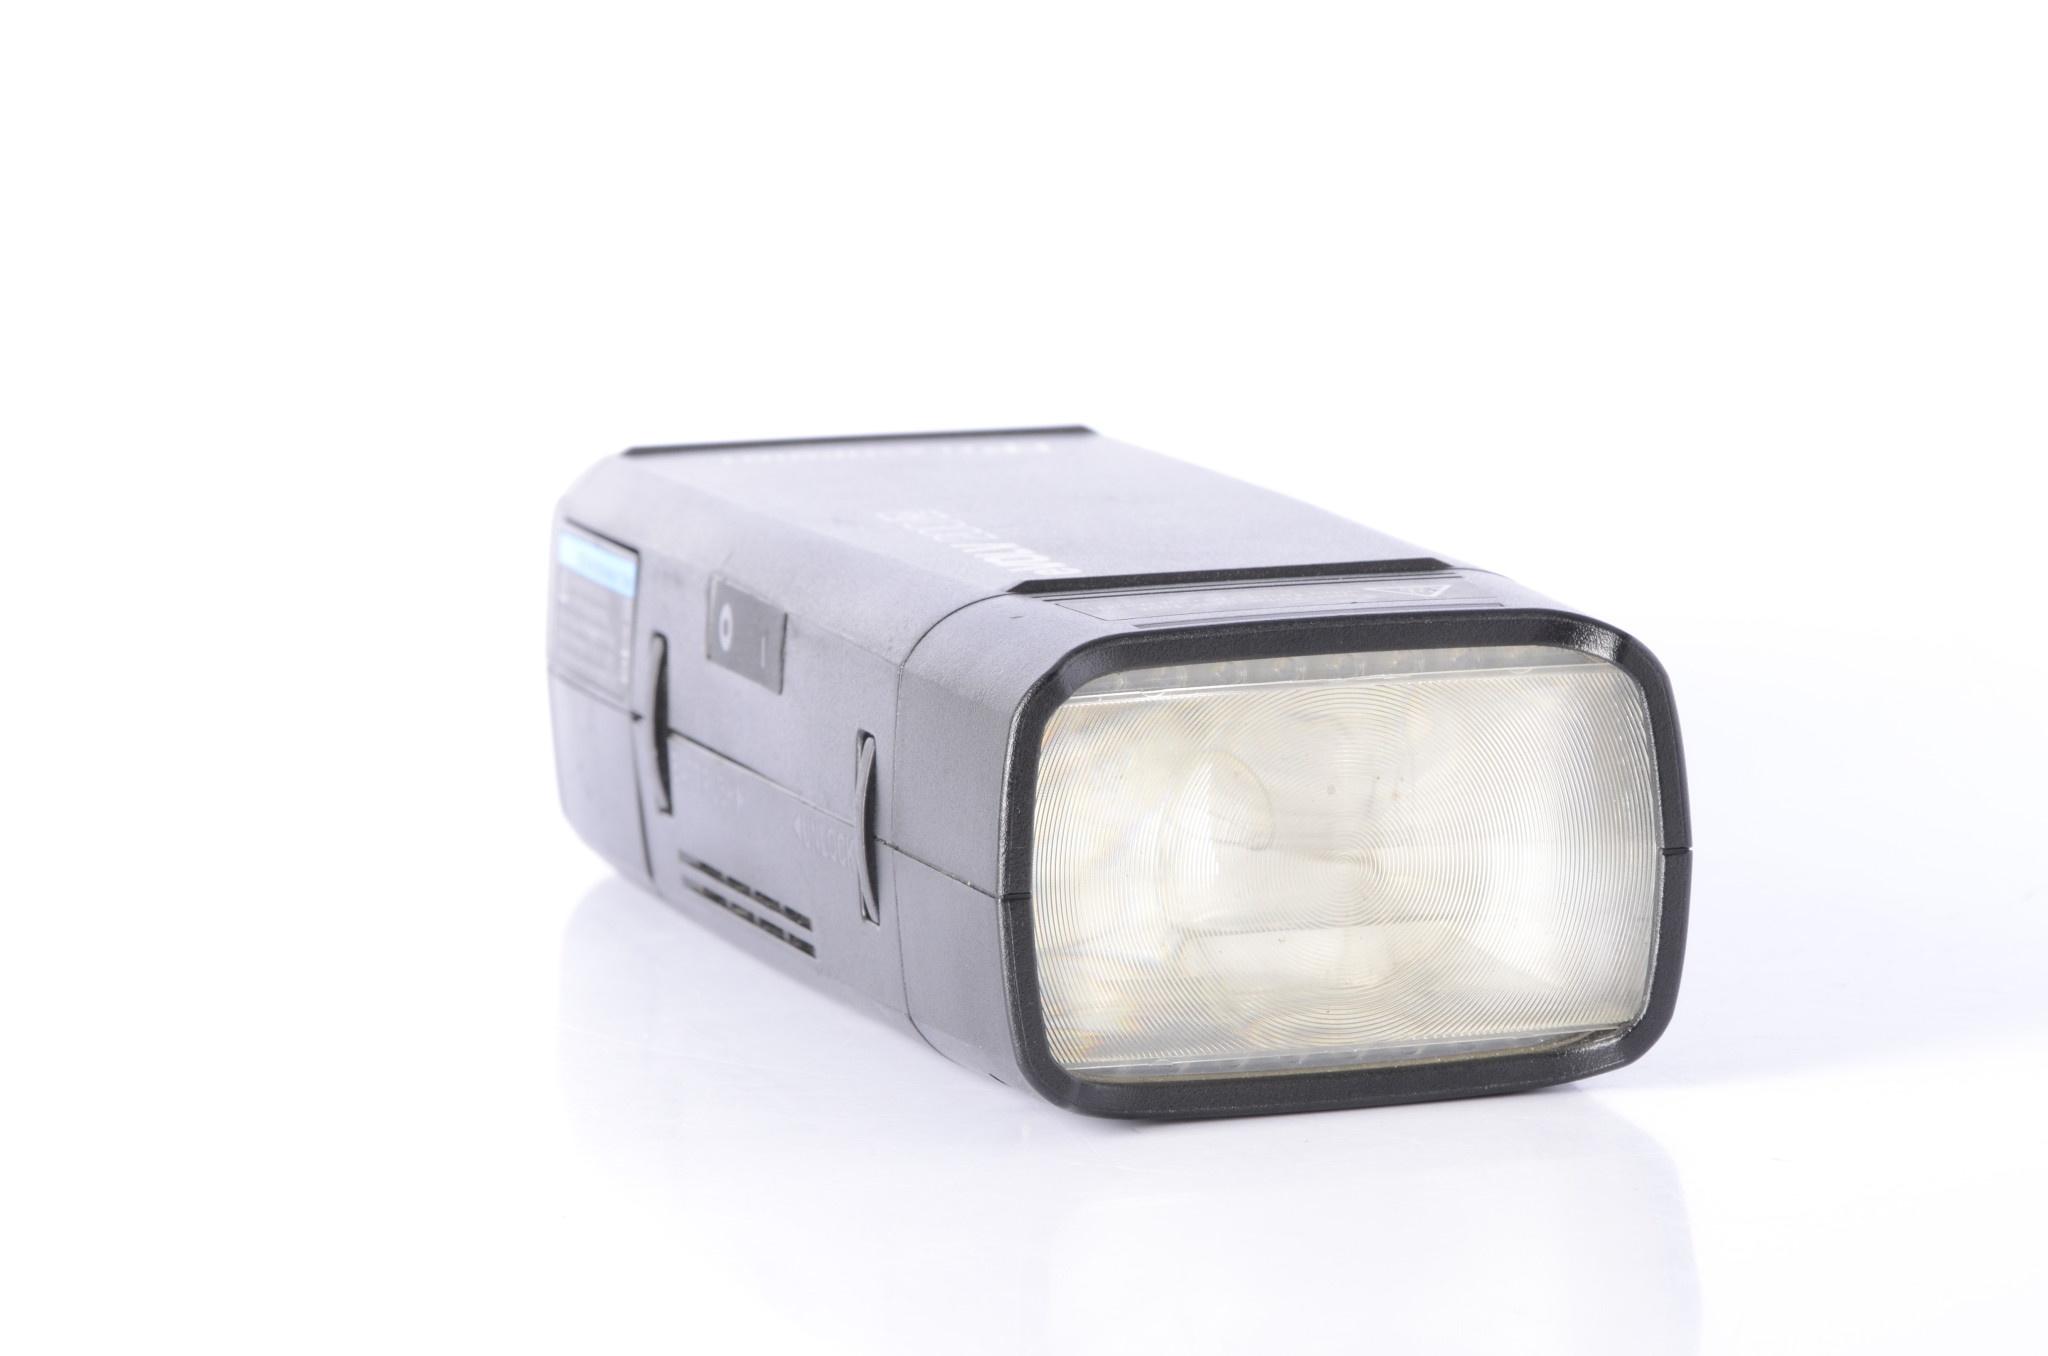 Flashpoint Flashpoint Evolv 200 R2 TTL Flash w/ Nikon Transmitter USED